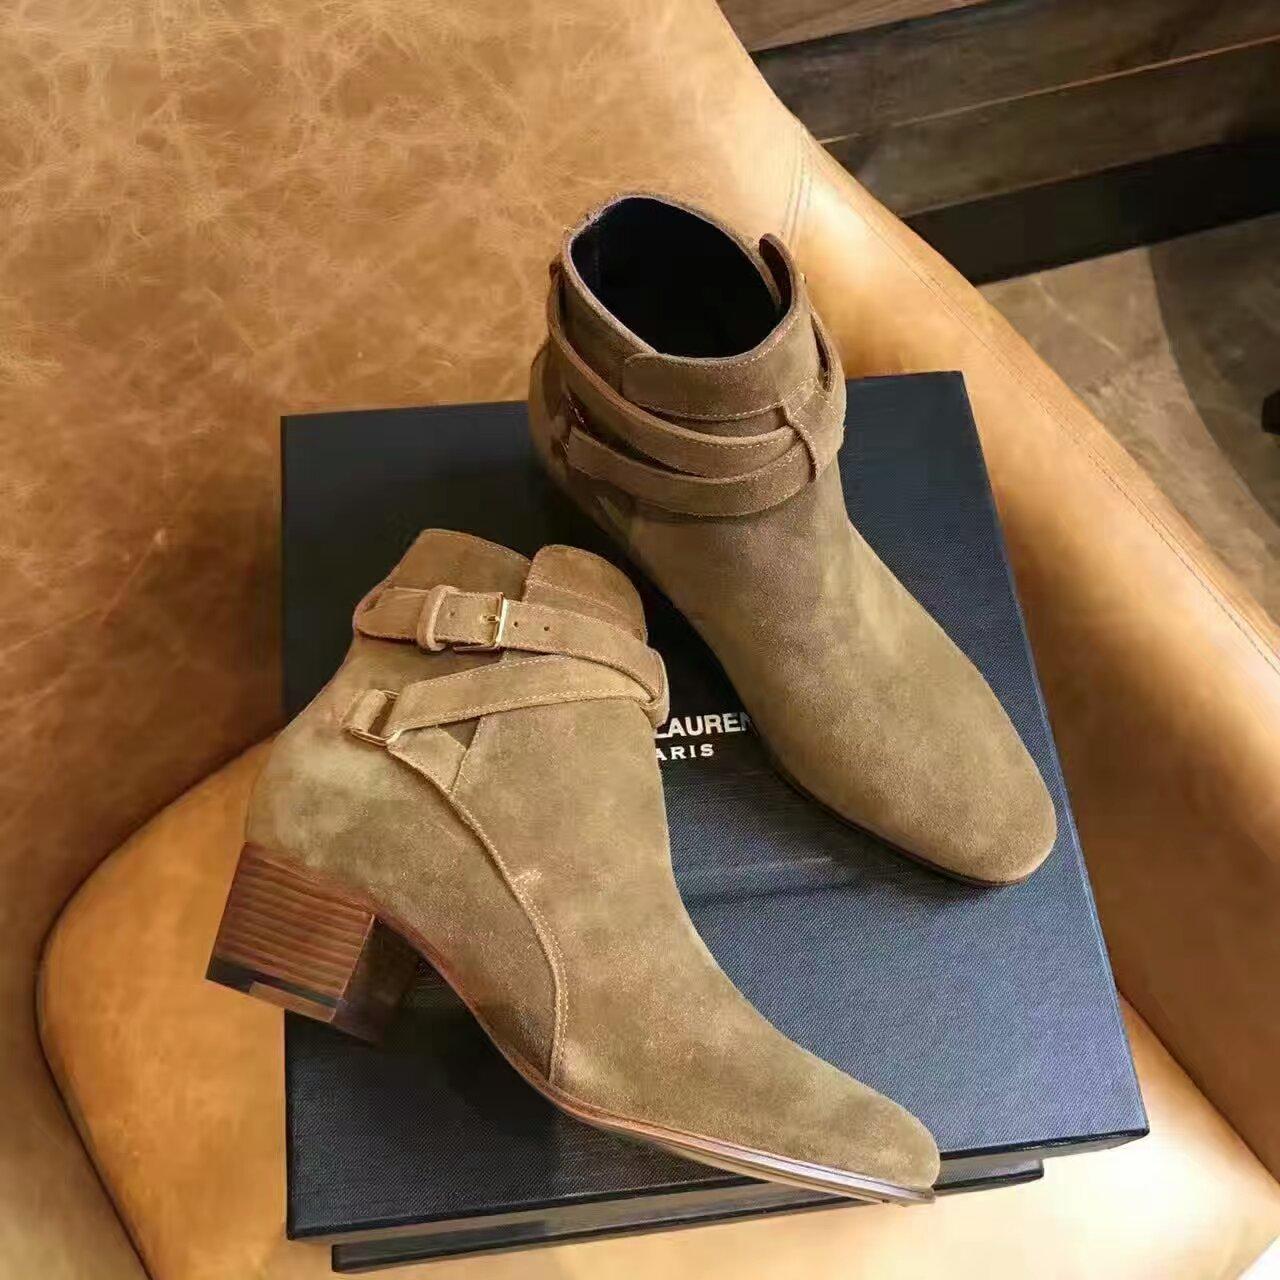 代购级别 SAINT LAURENT PARIS 裸靴!!